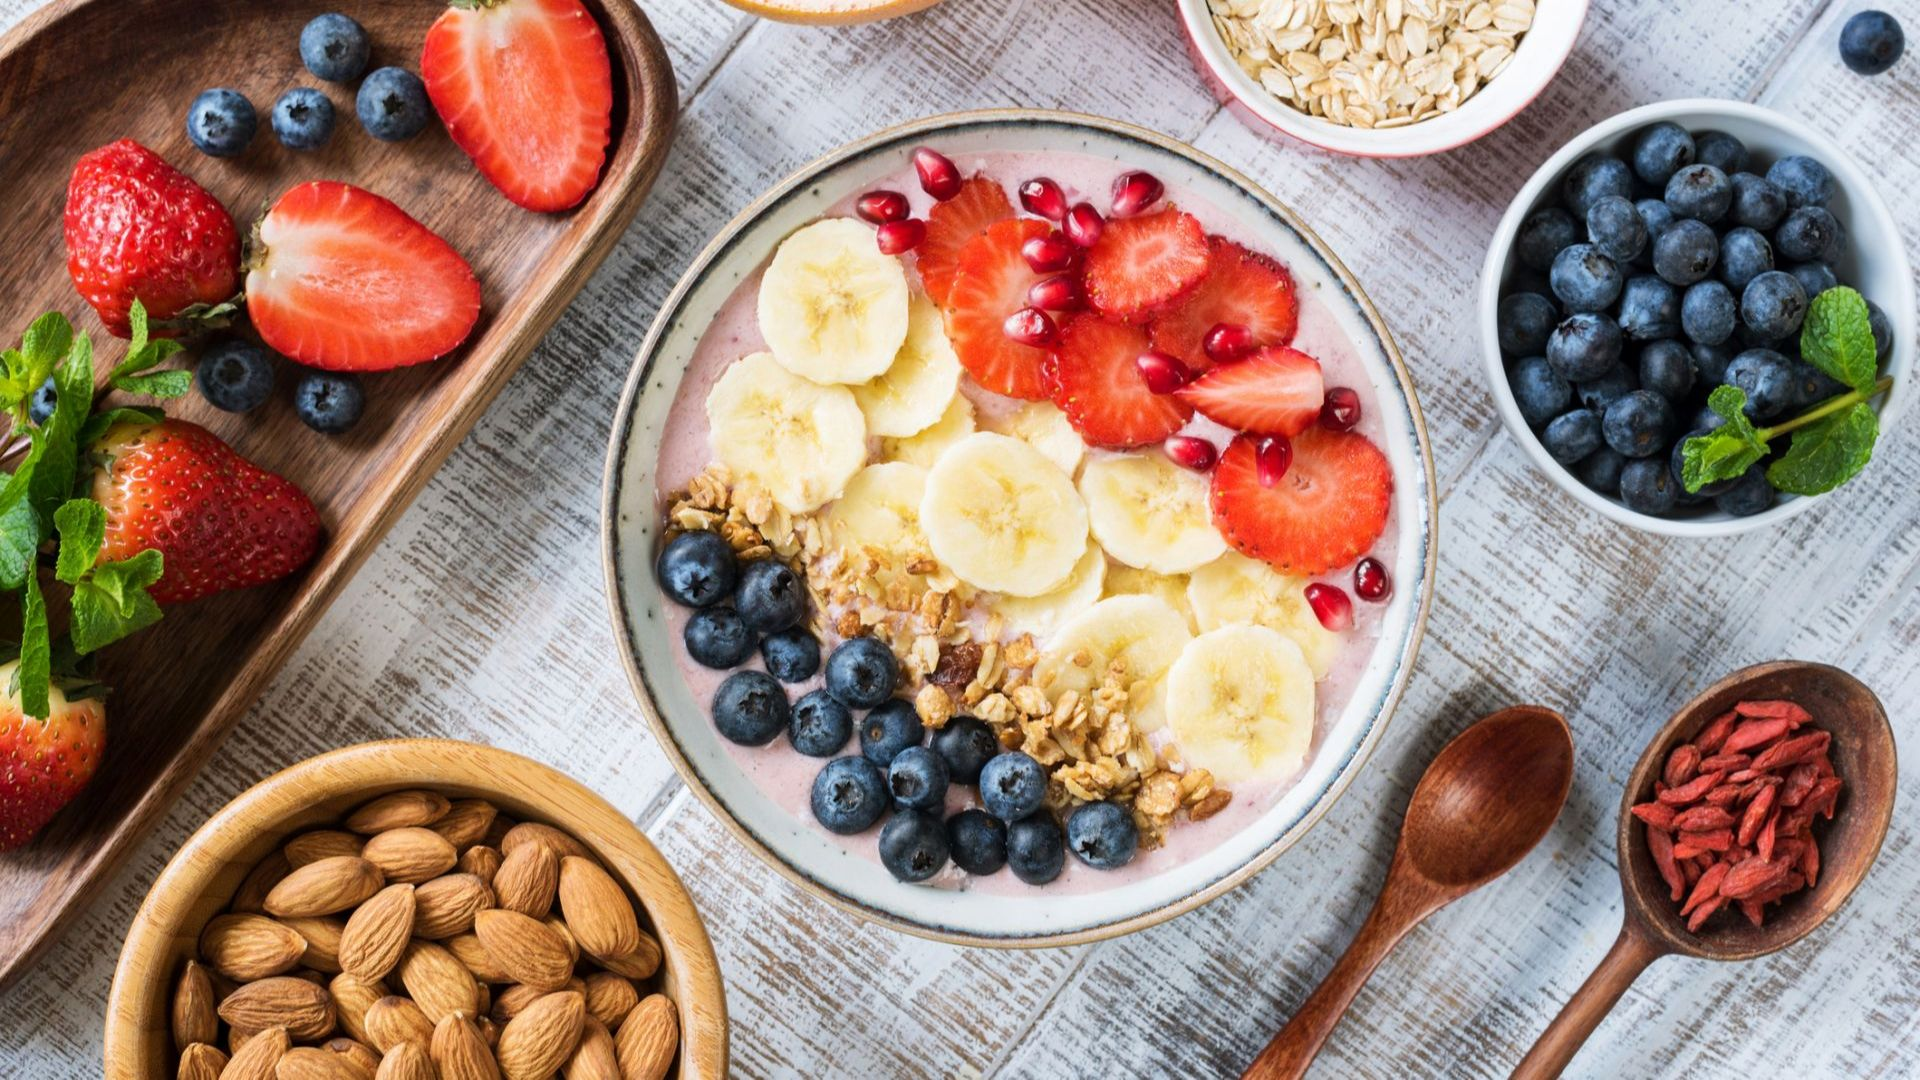 Бързи и лесни рецепти за здравословна закуска